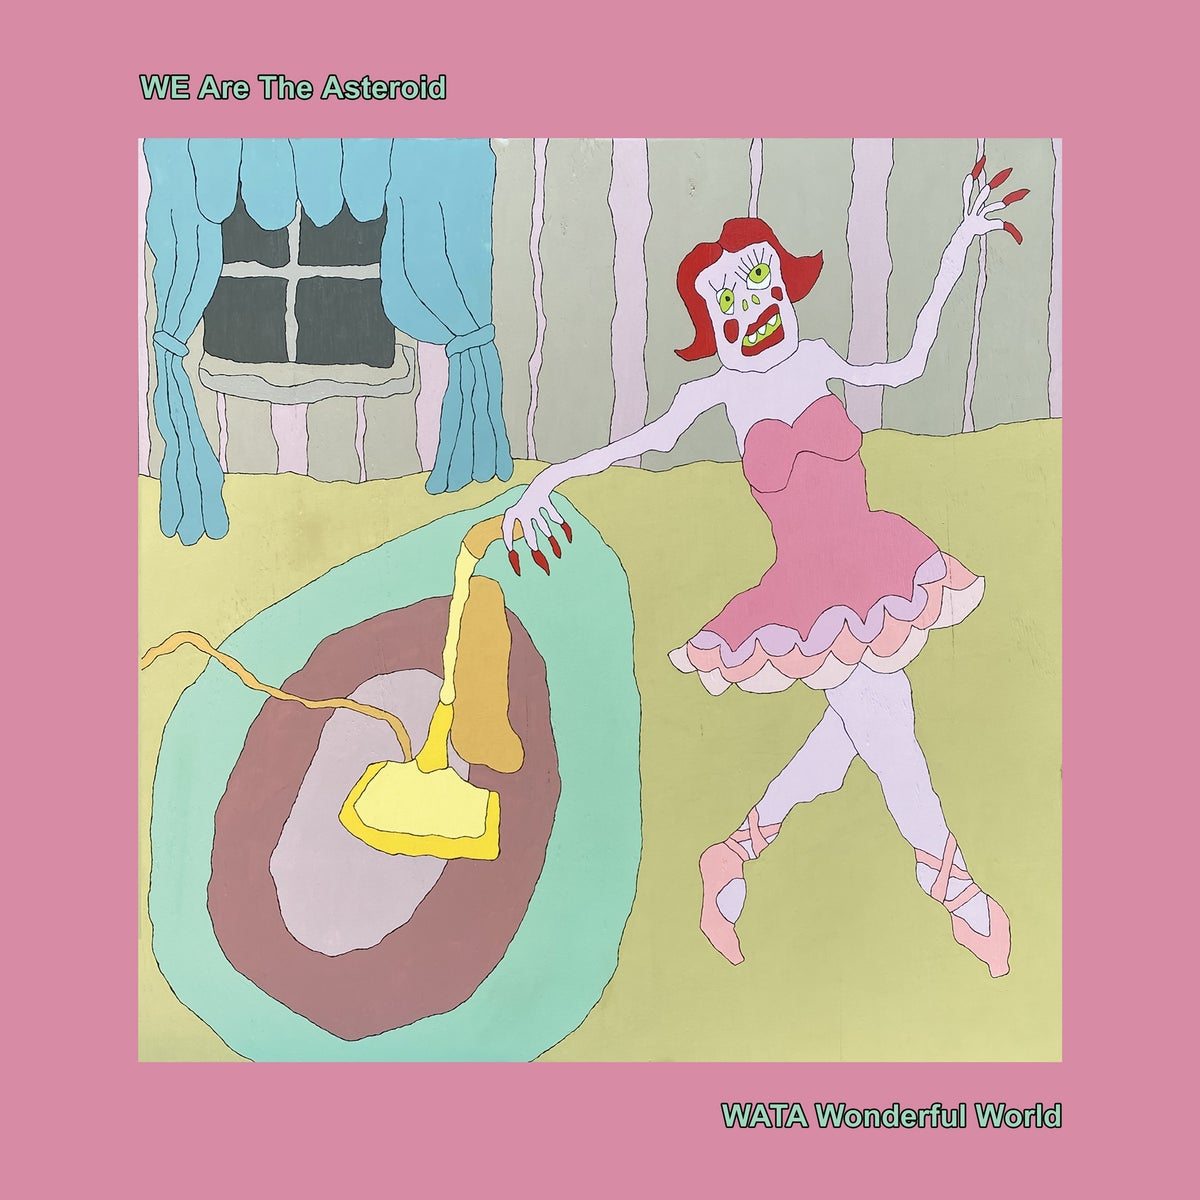 Image of WATA Wonderful World - Album